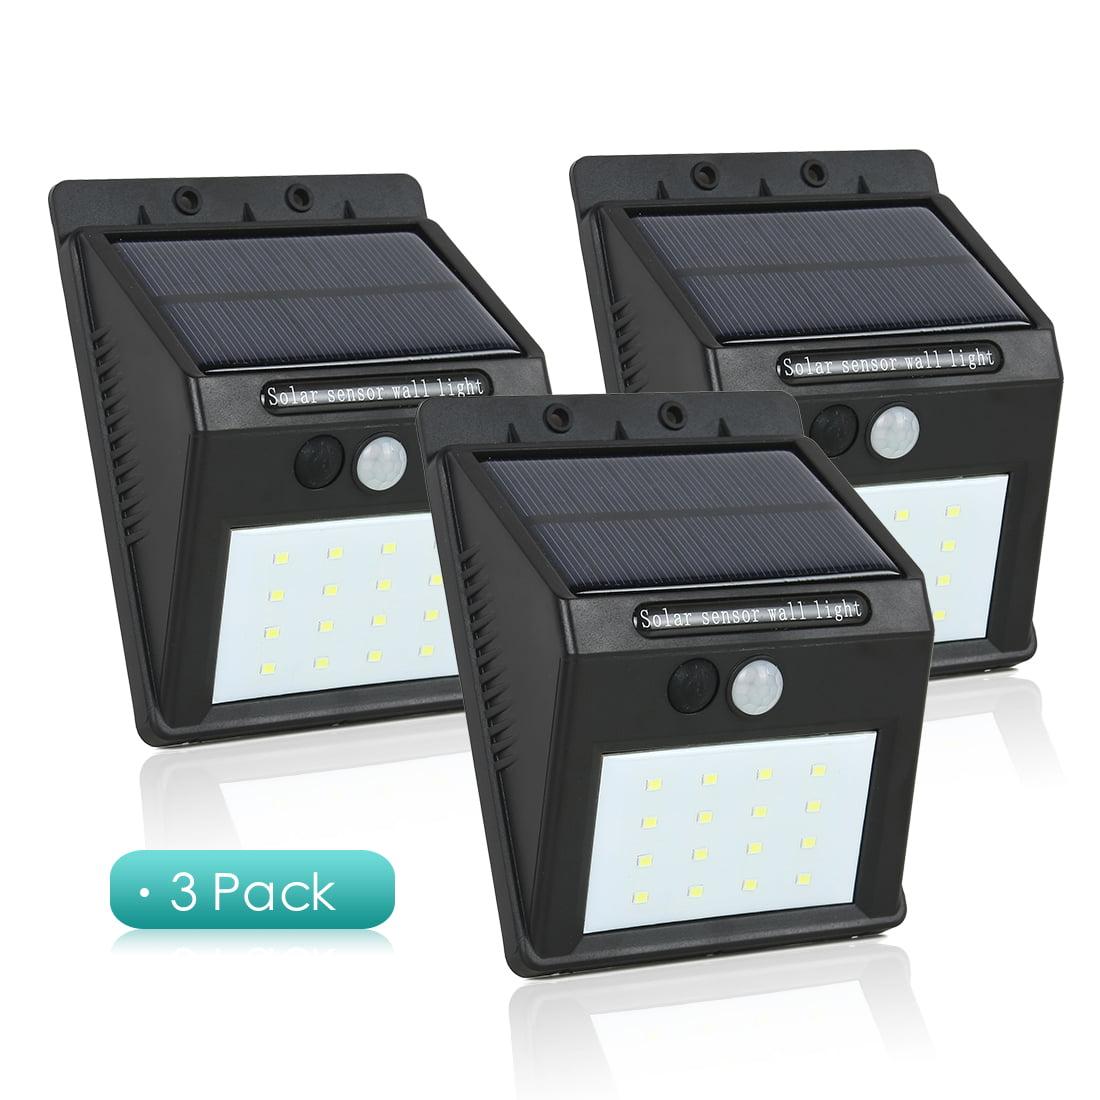 3Pcs LED Solar Light PIR CDS Motion Sensor Lamp 16 LEDs 80lm Waterproof Wireless by